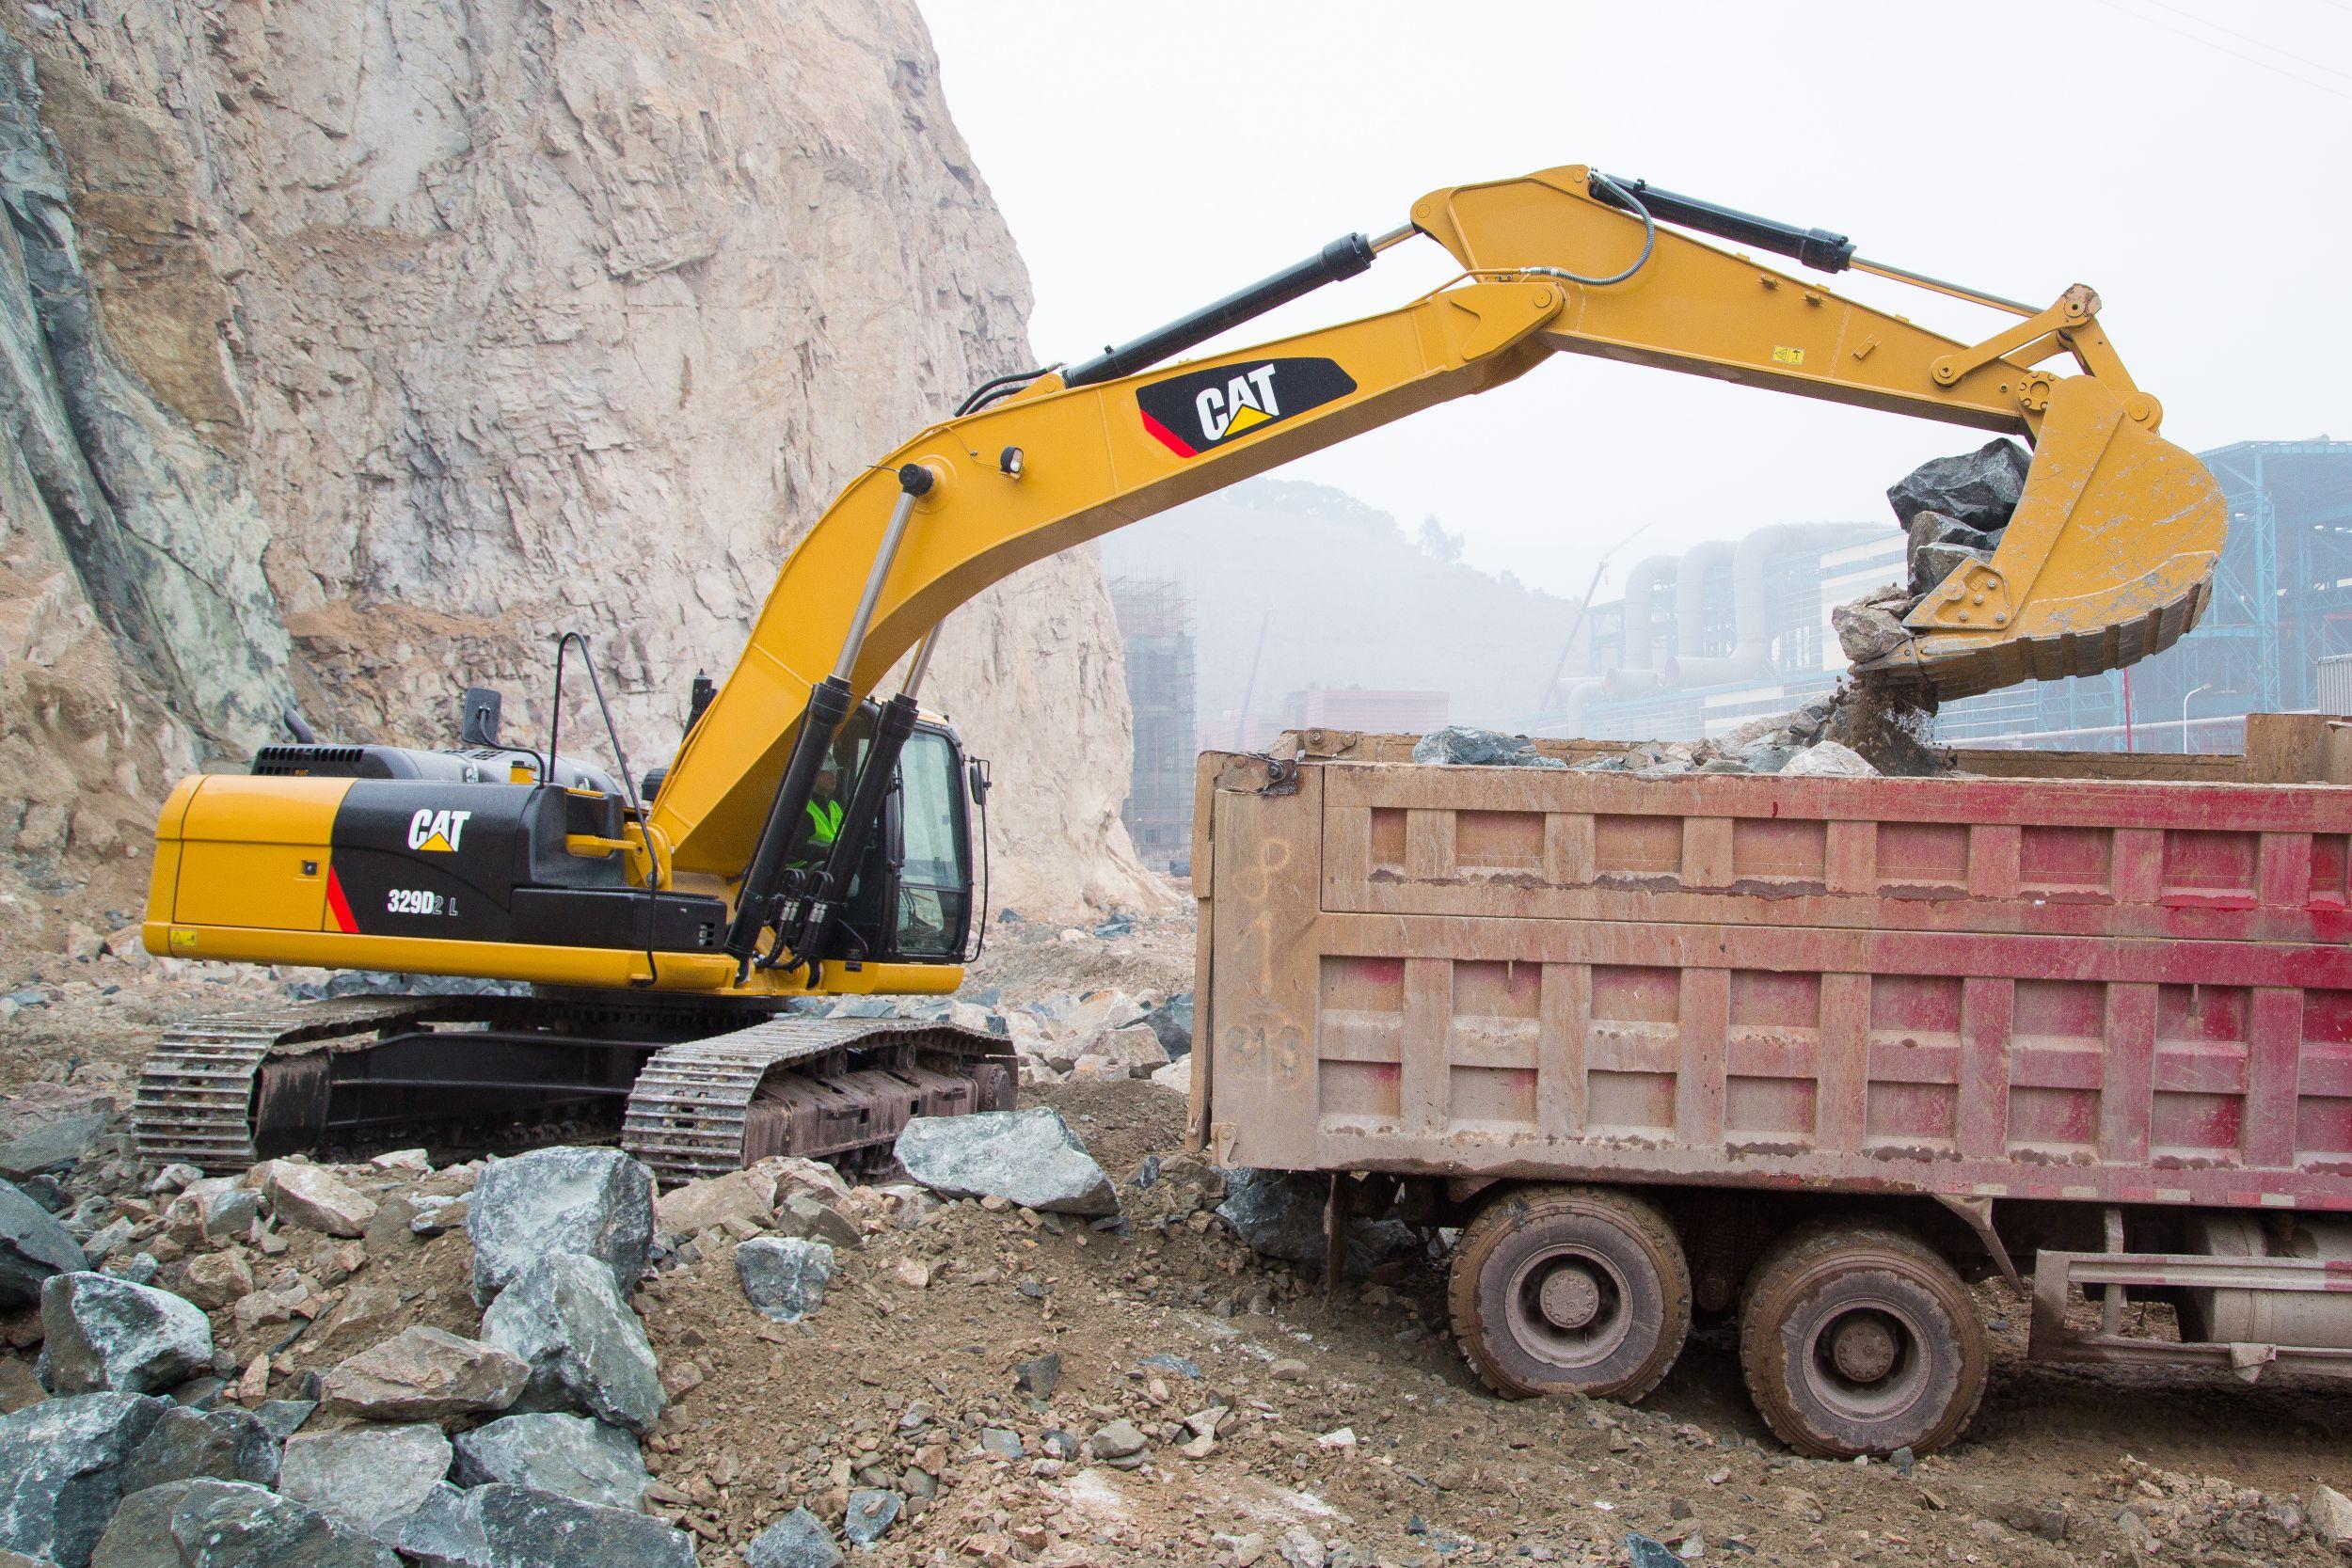 Cat | Cat® 329D2 Excavator Features World-Class Design, Powerful